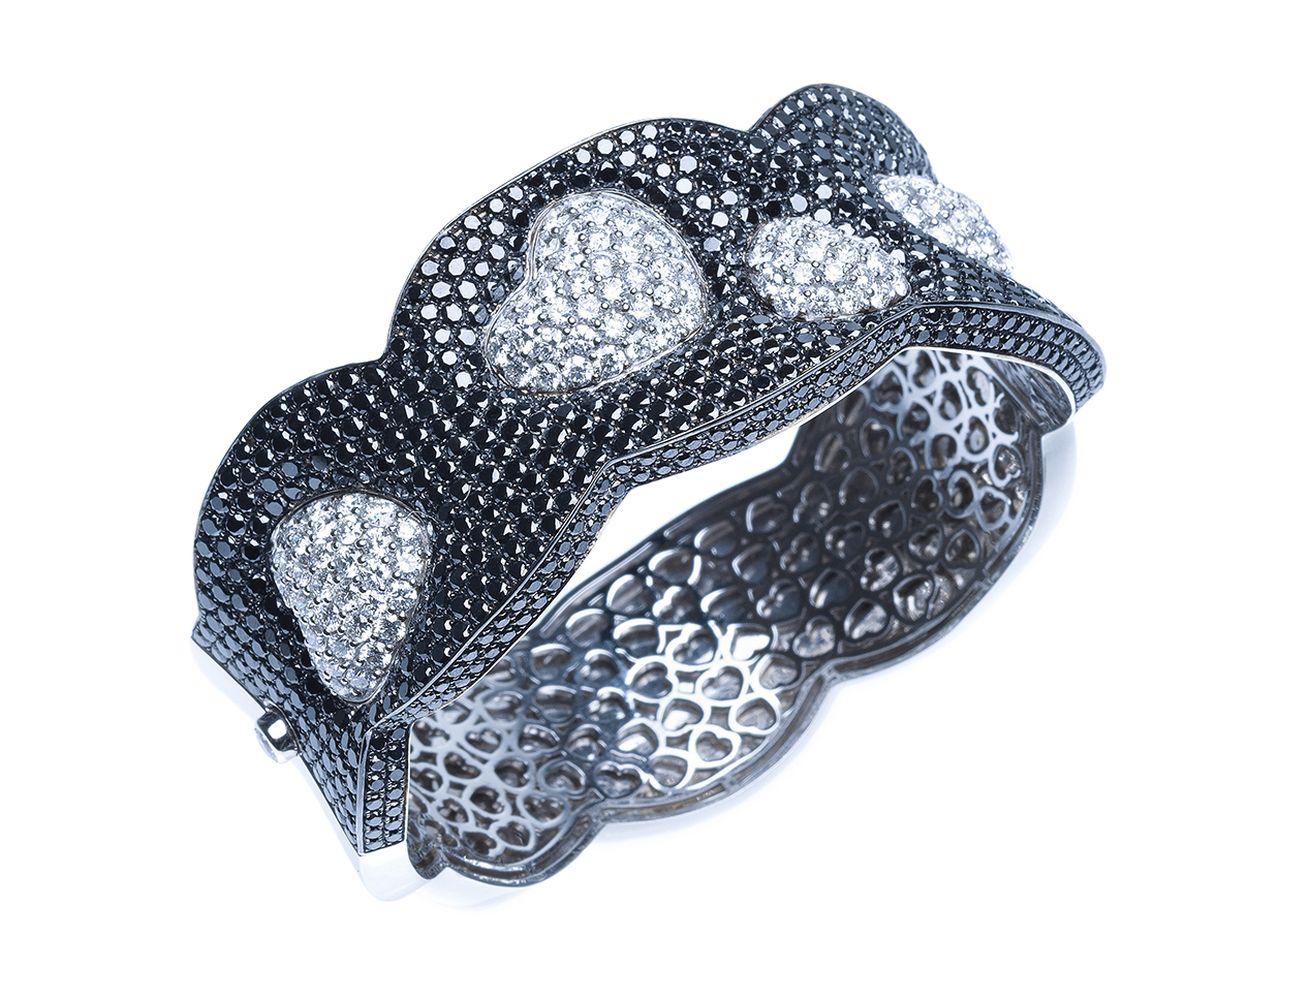 #60 Brilliant Bracelet | Brillantarmband Image